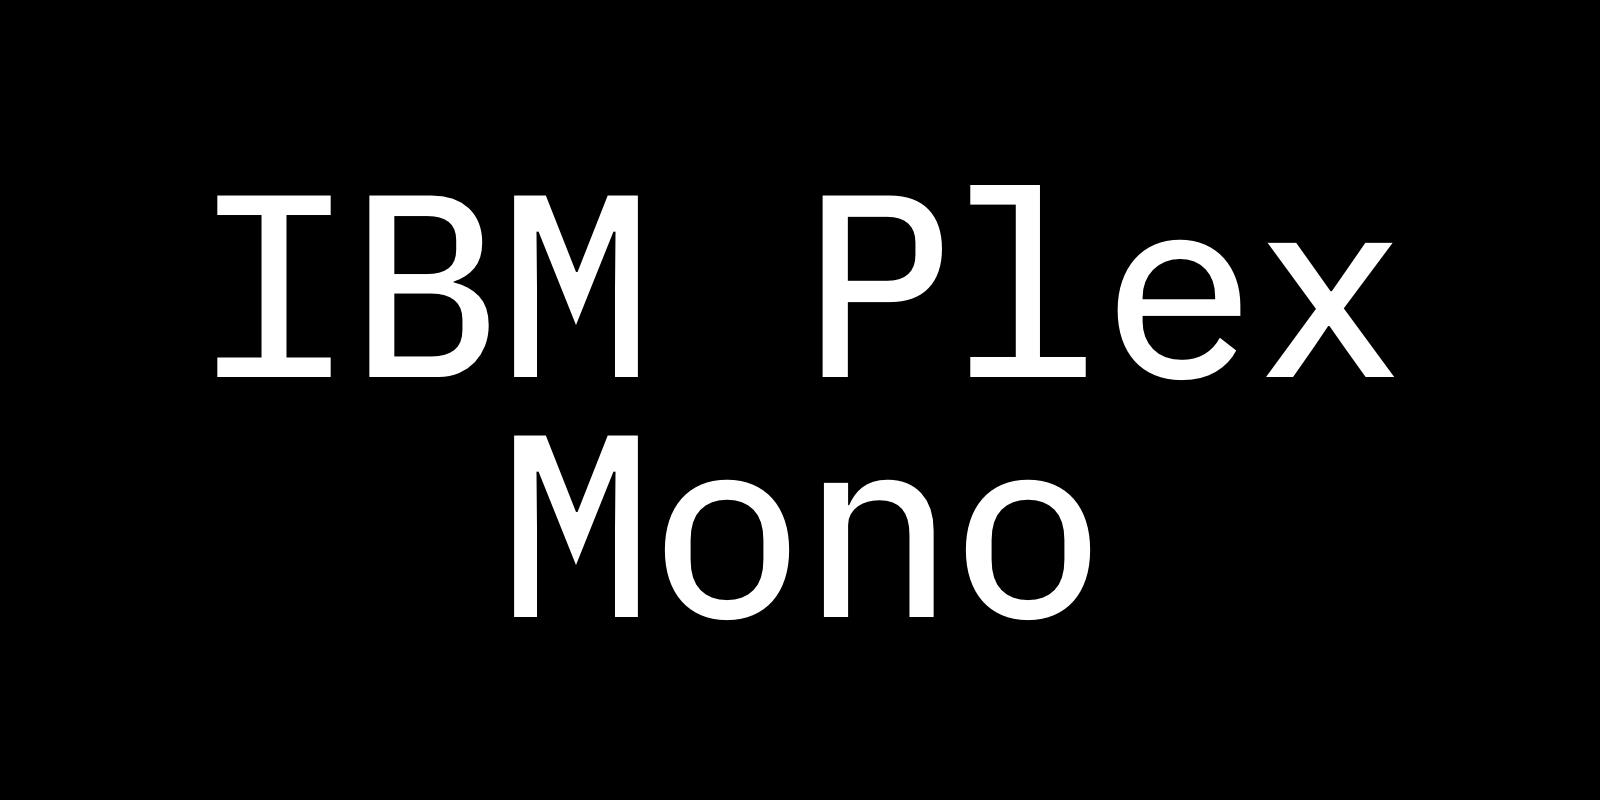 Complete Guide to IBM Plex Mono • Beautiful Web Type